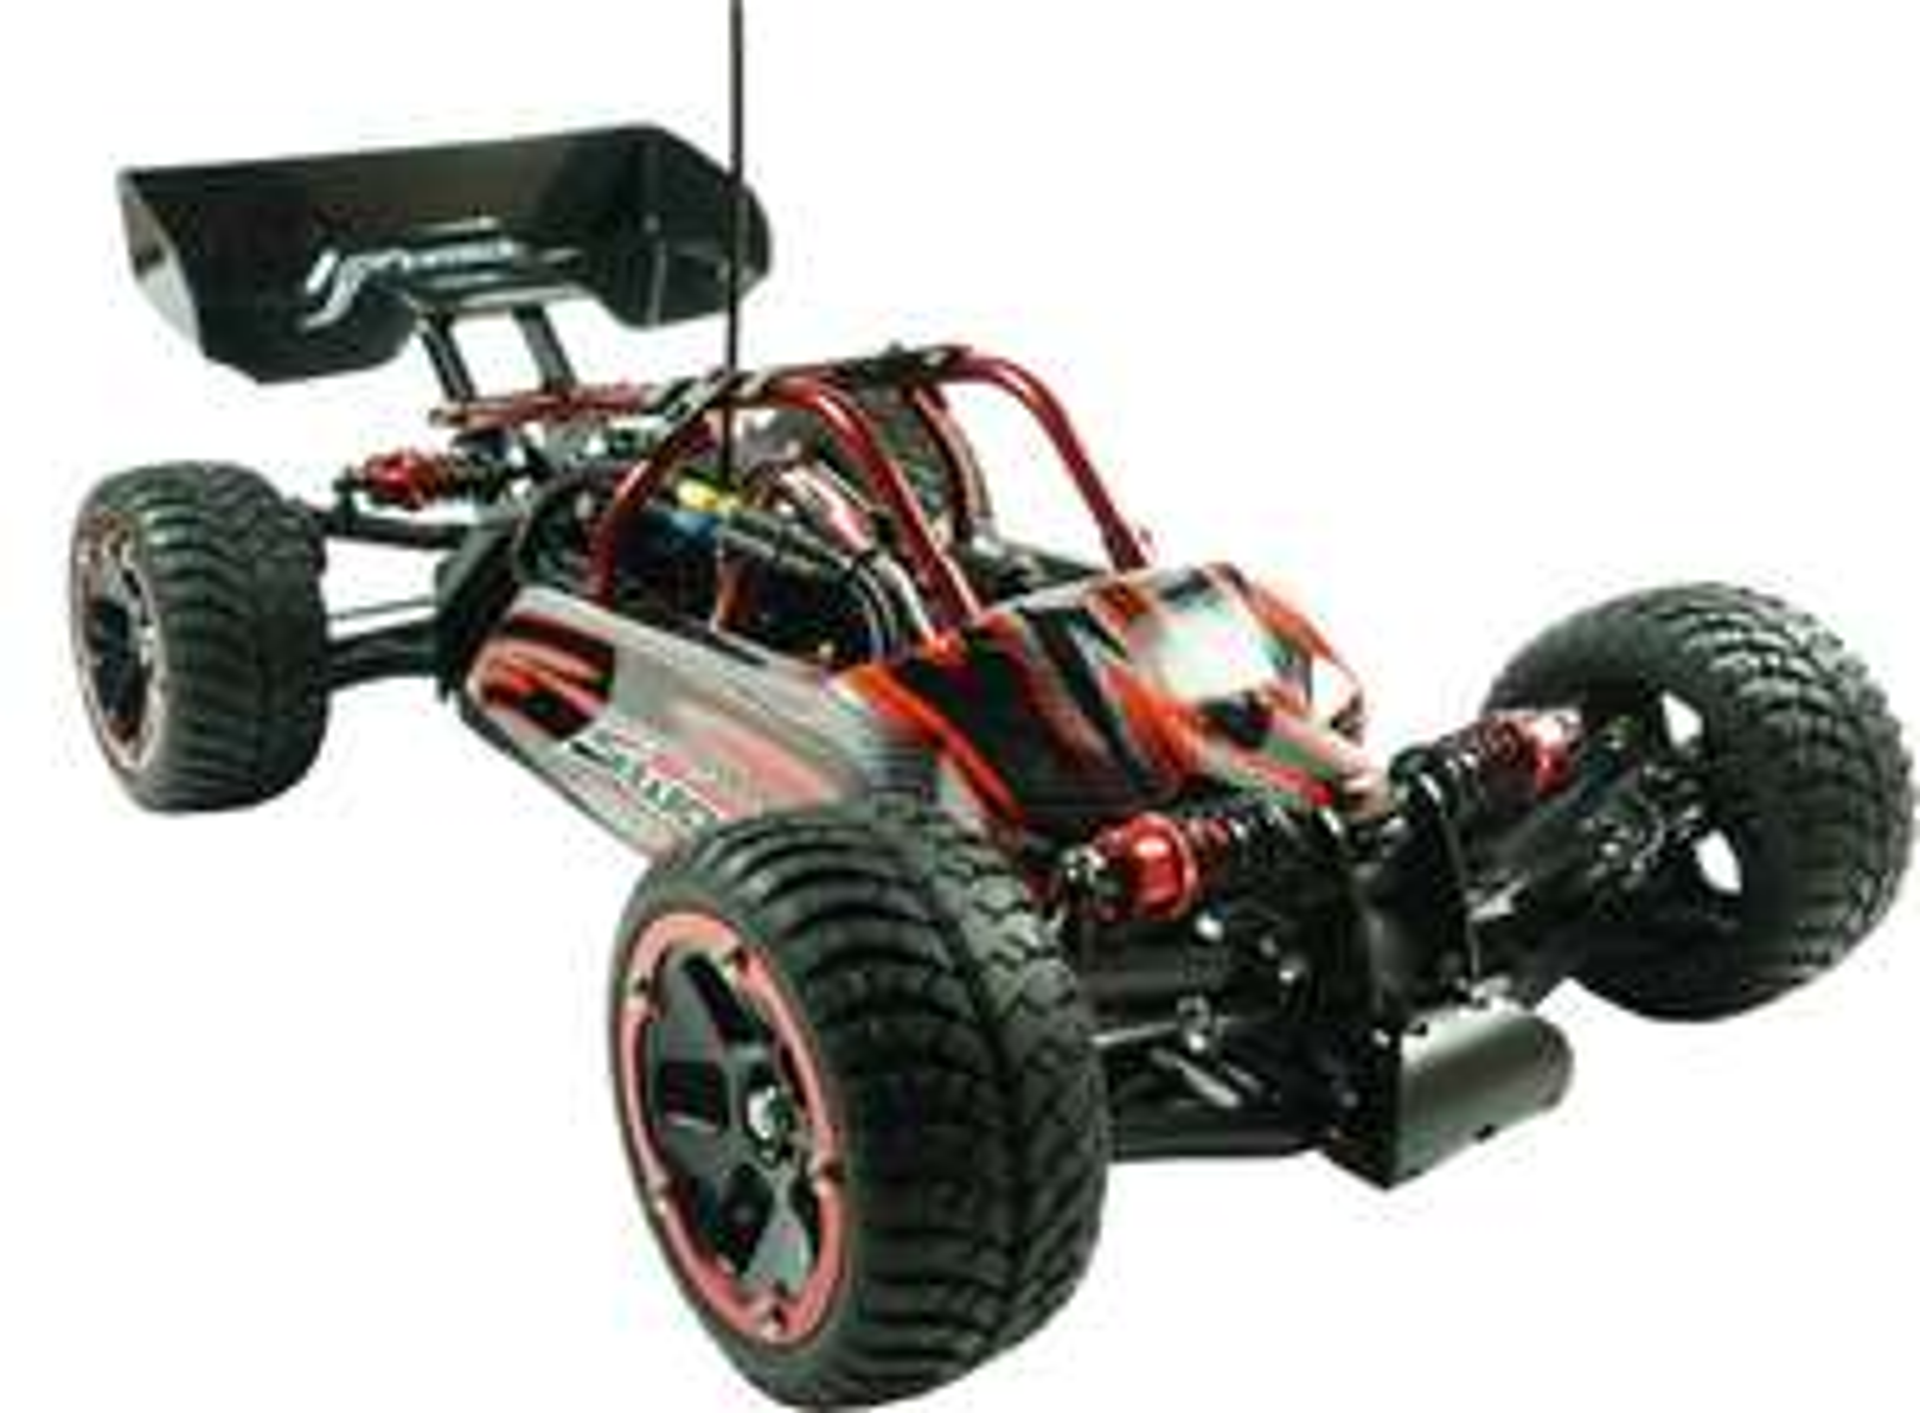 Voiture RC Buggy 4x4 Sworkz Fox 44 Brushless 1/10 ARTR (lindinger.at)